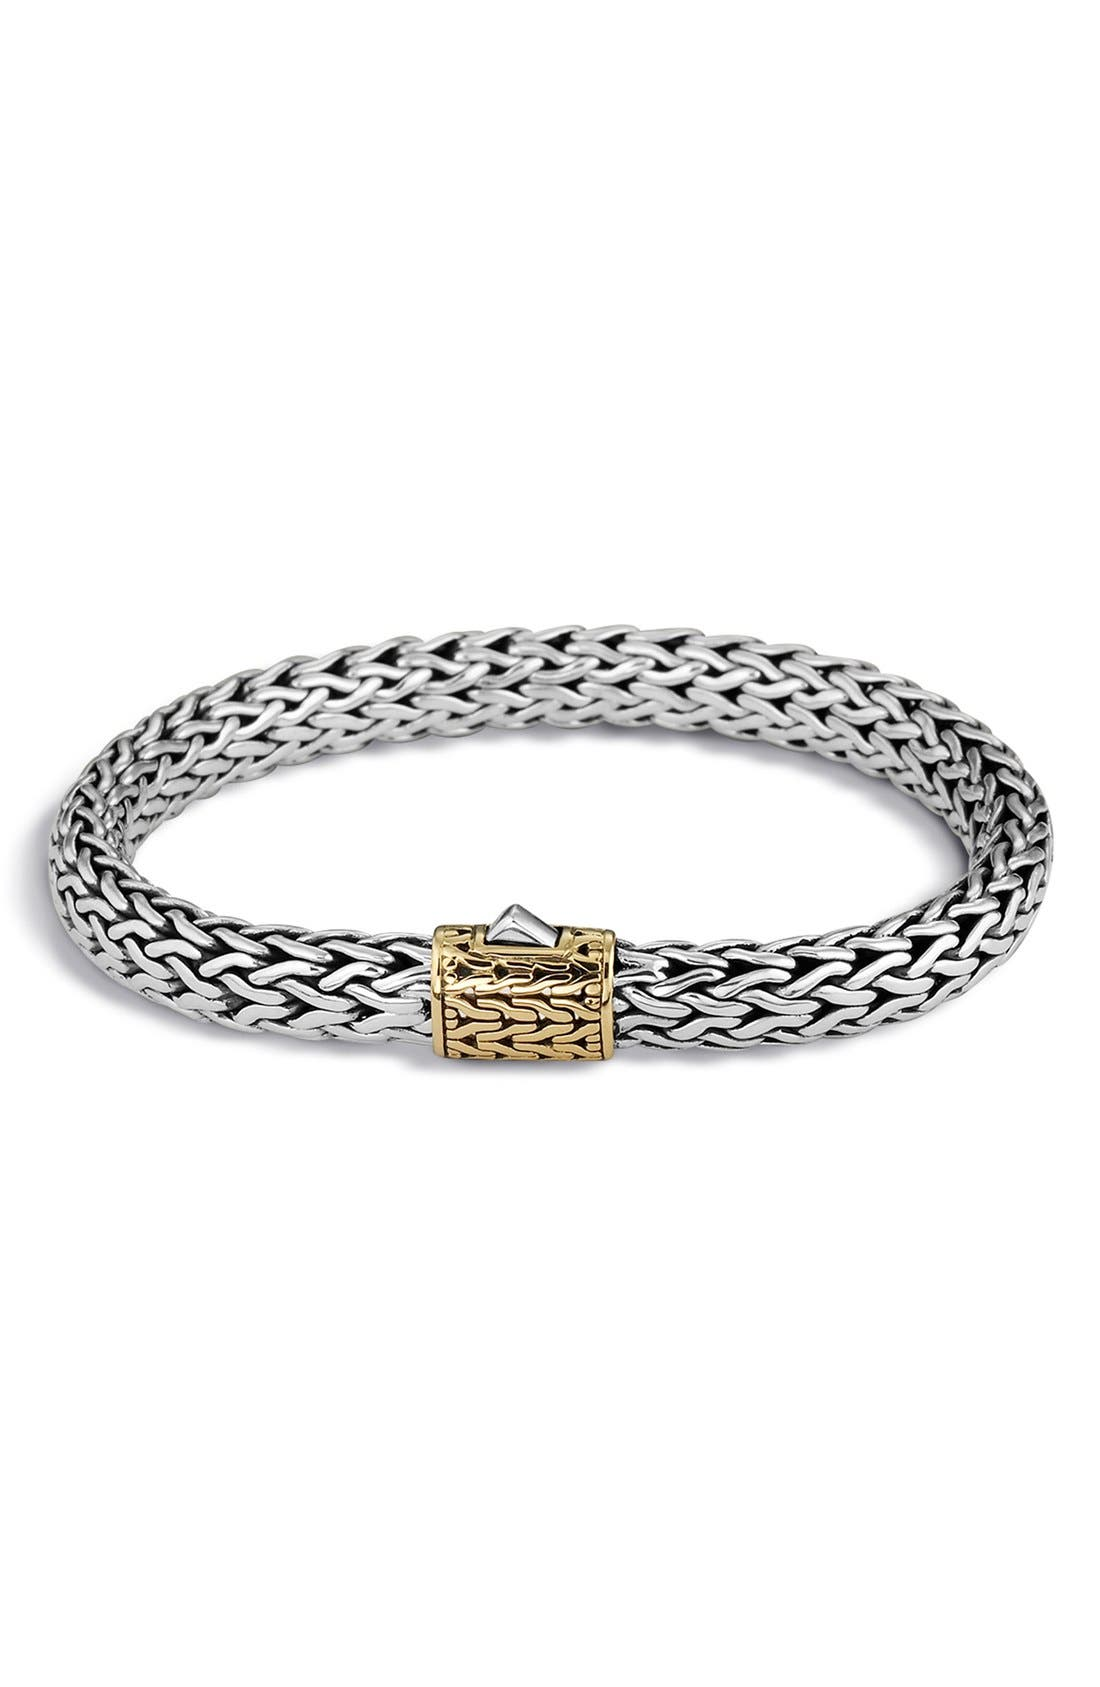 John Hardy 'Classic Chain' Medium Bracelet